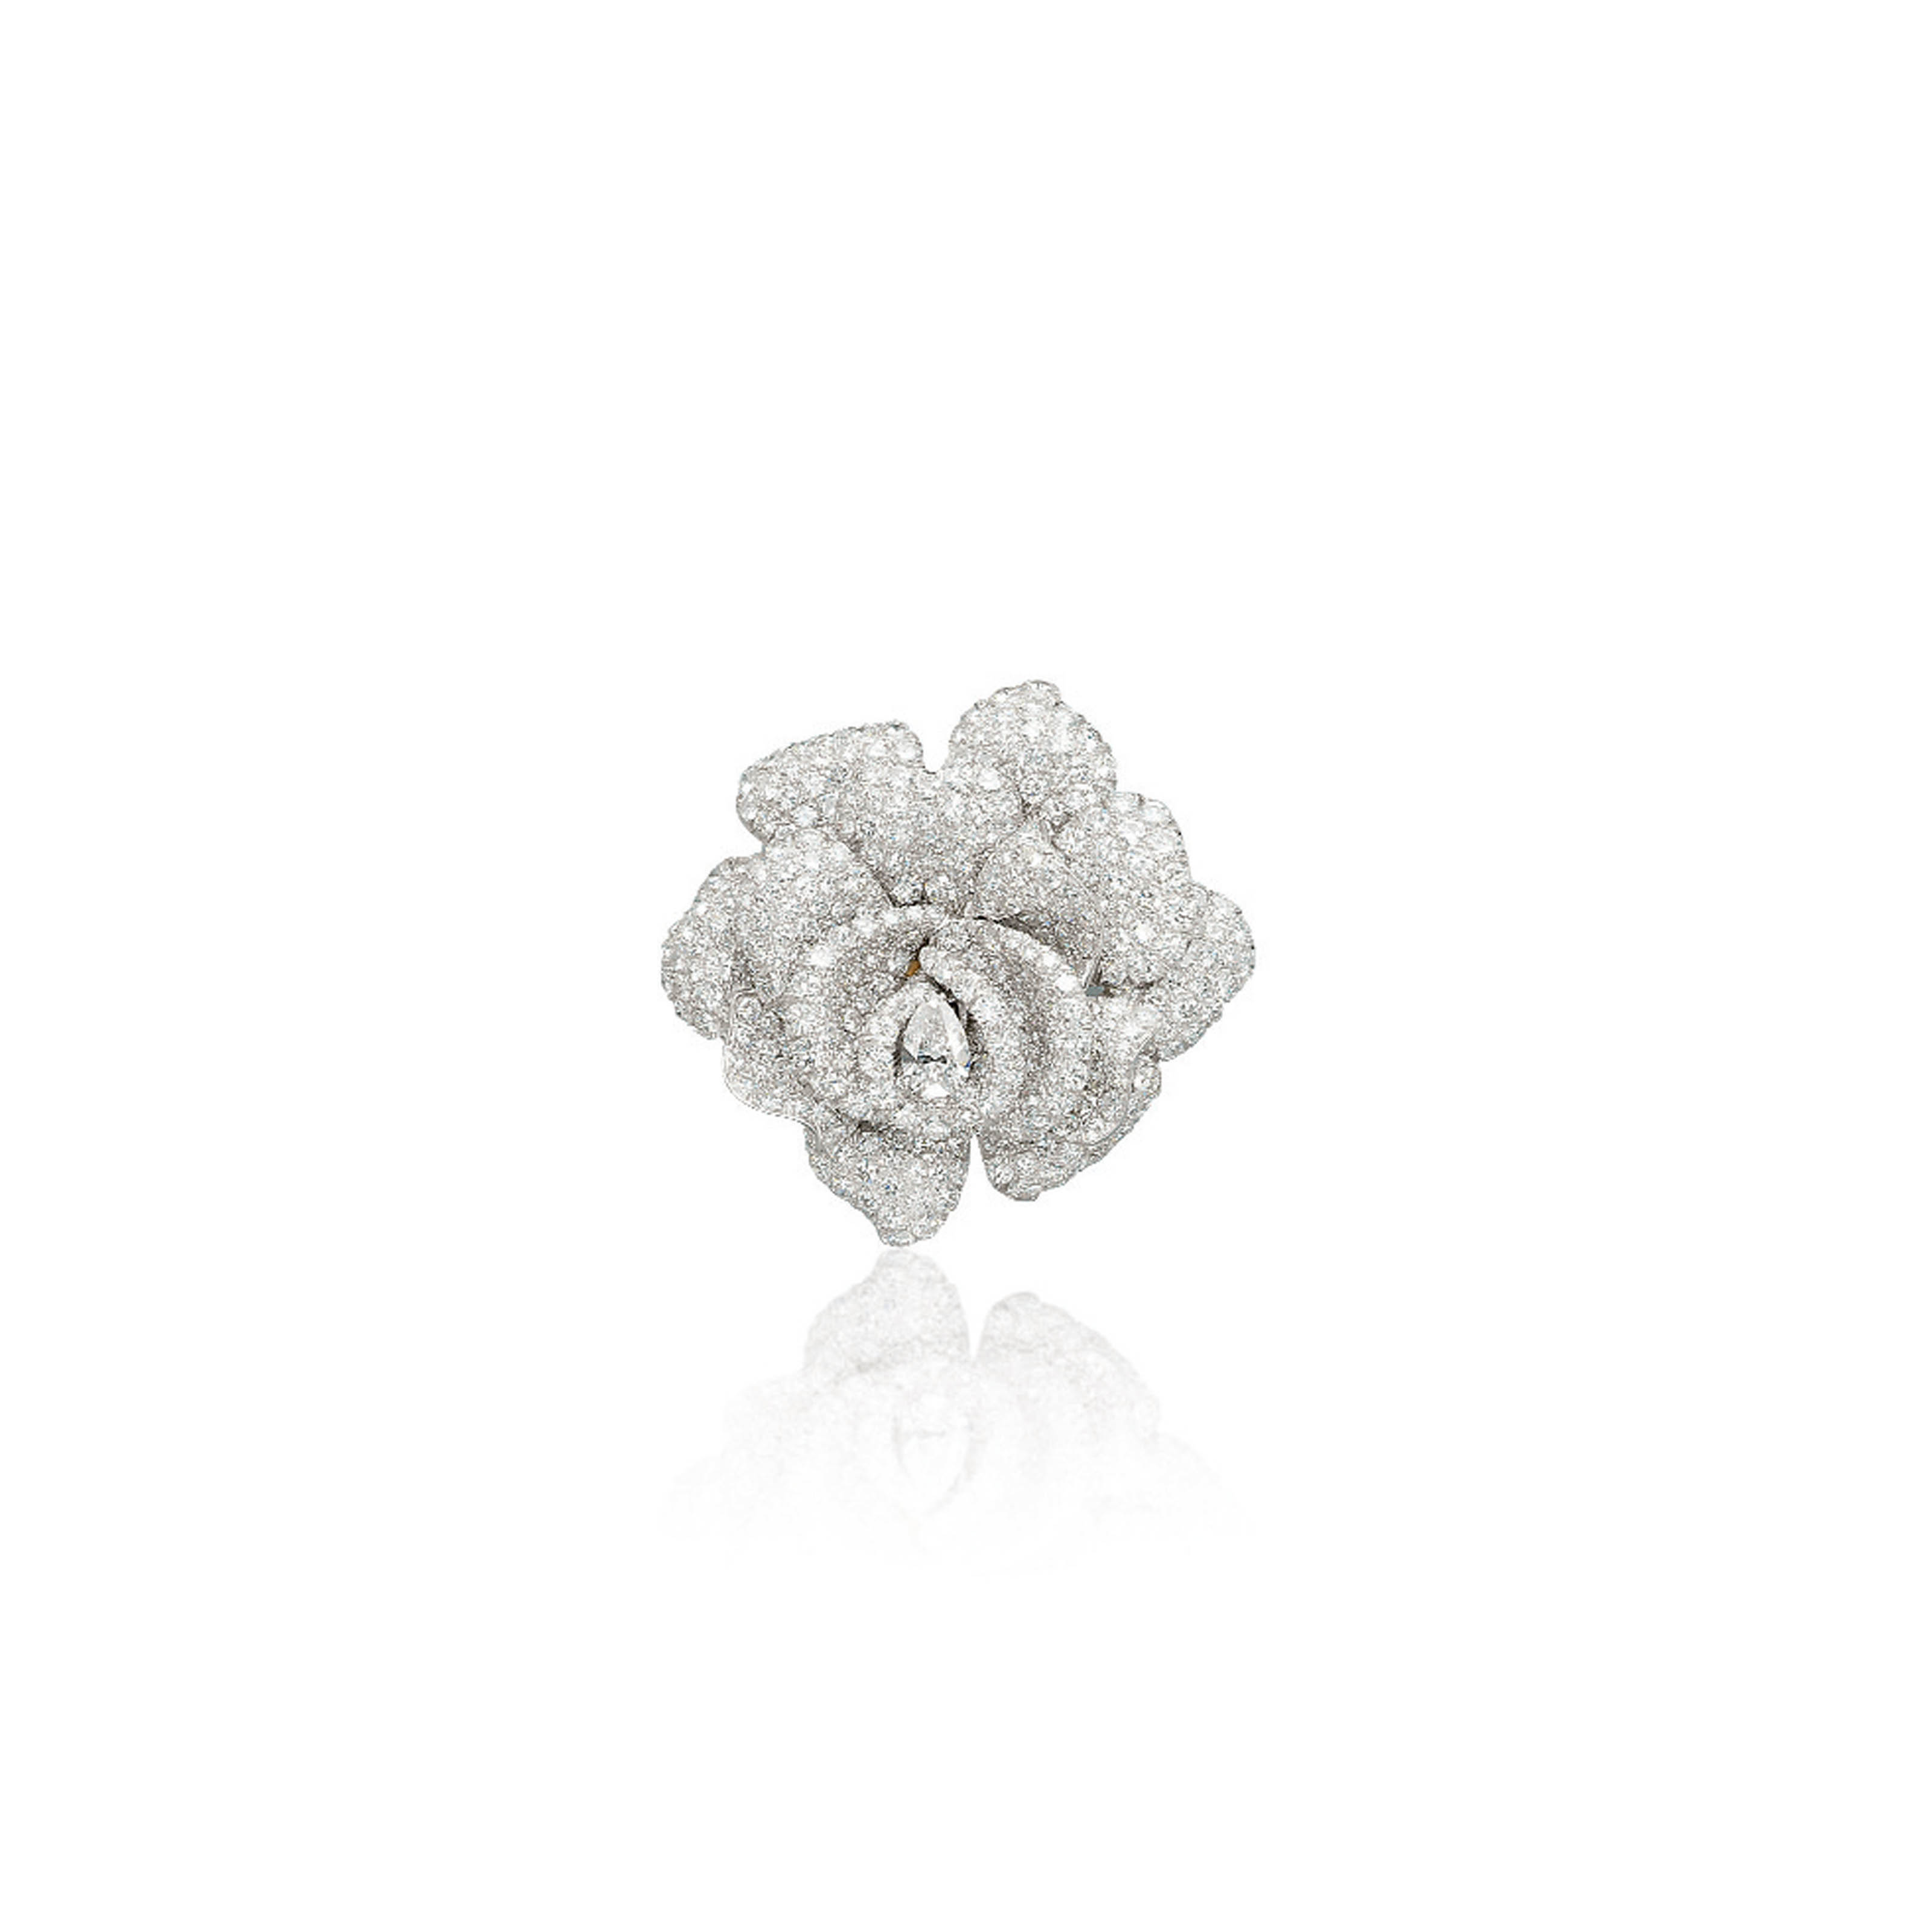 A DIAMOND FLOWER BROOCH, BY RUSER